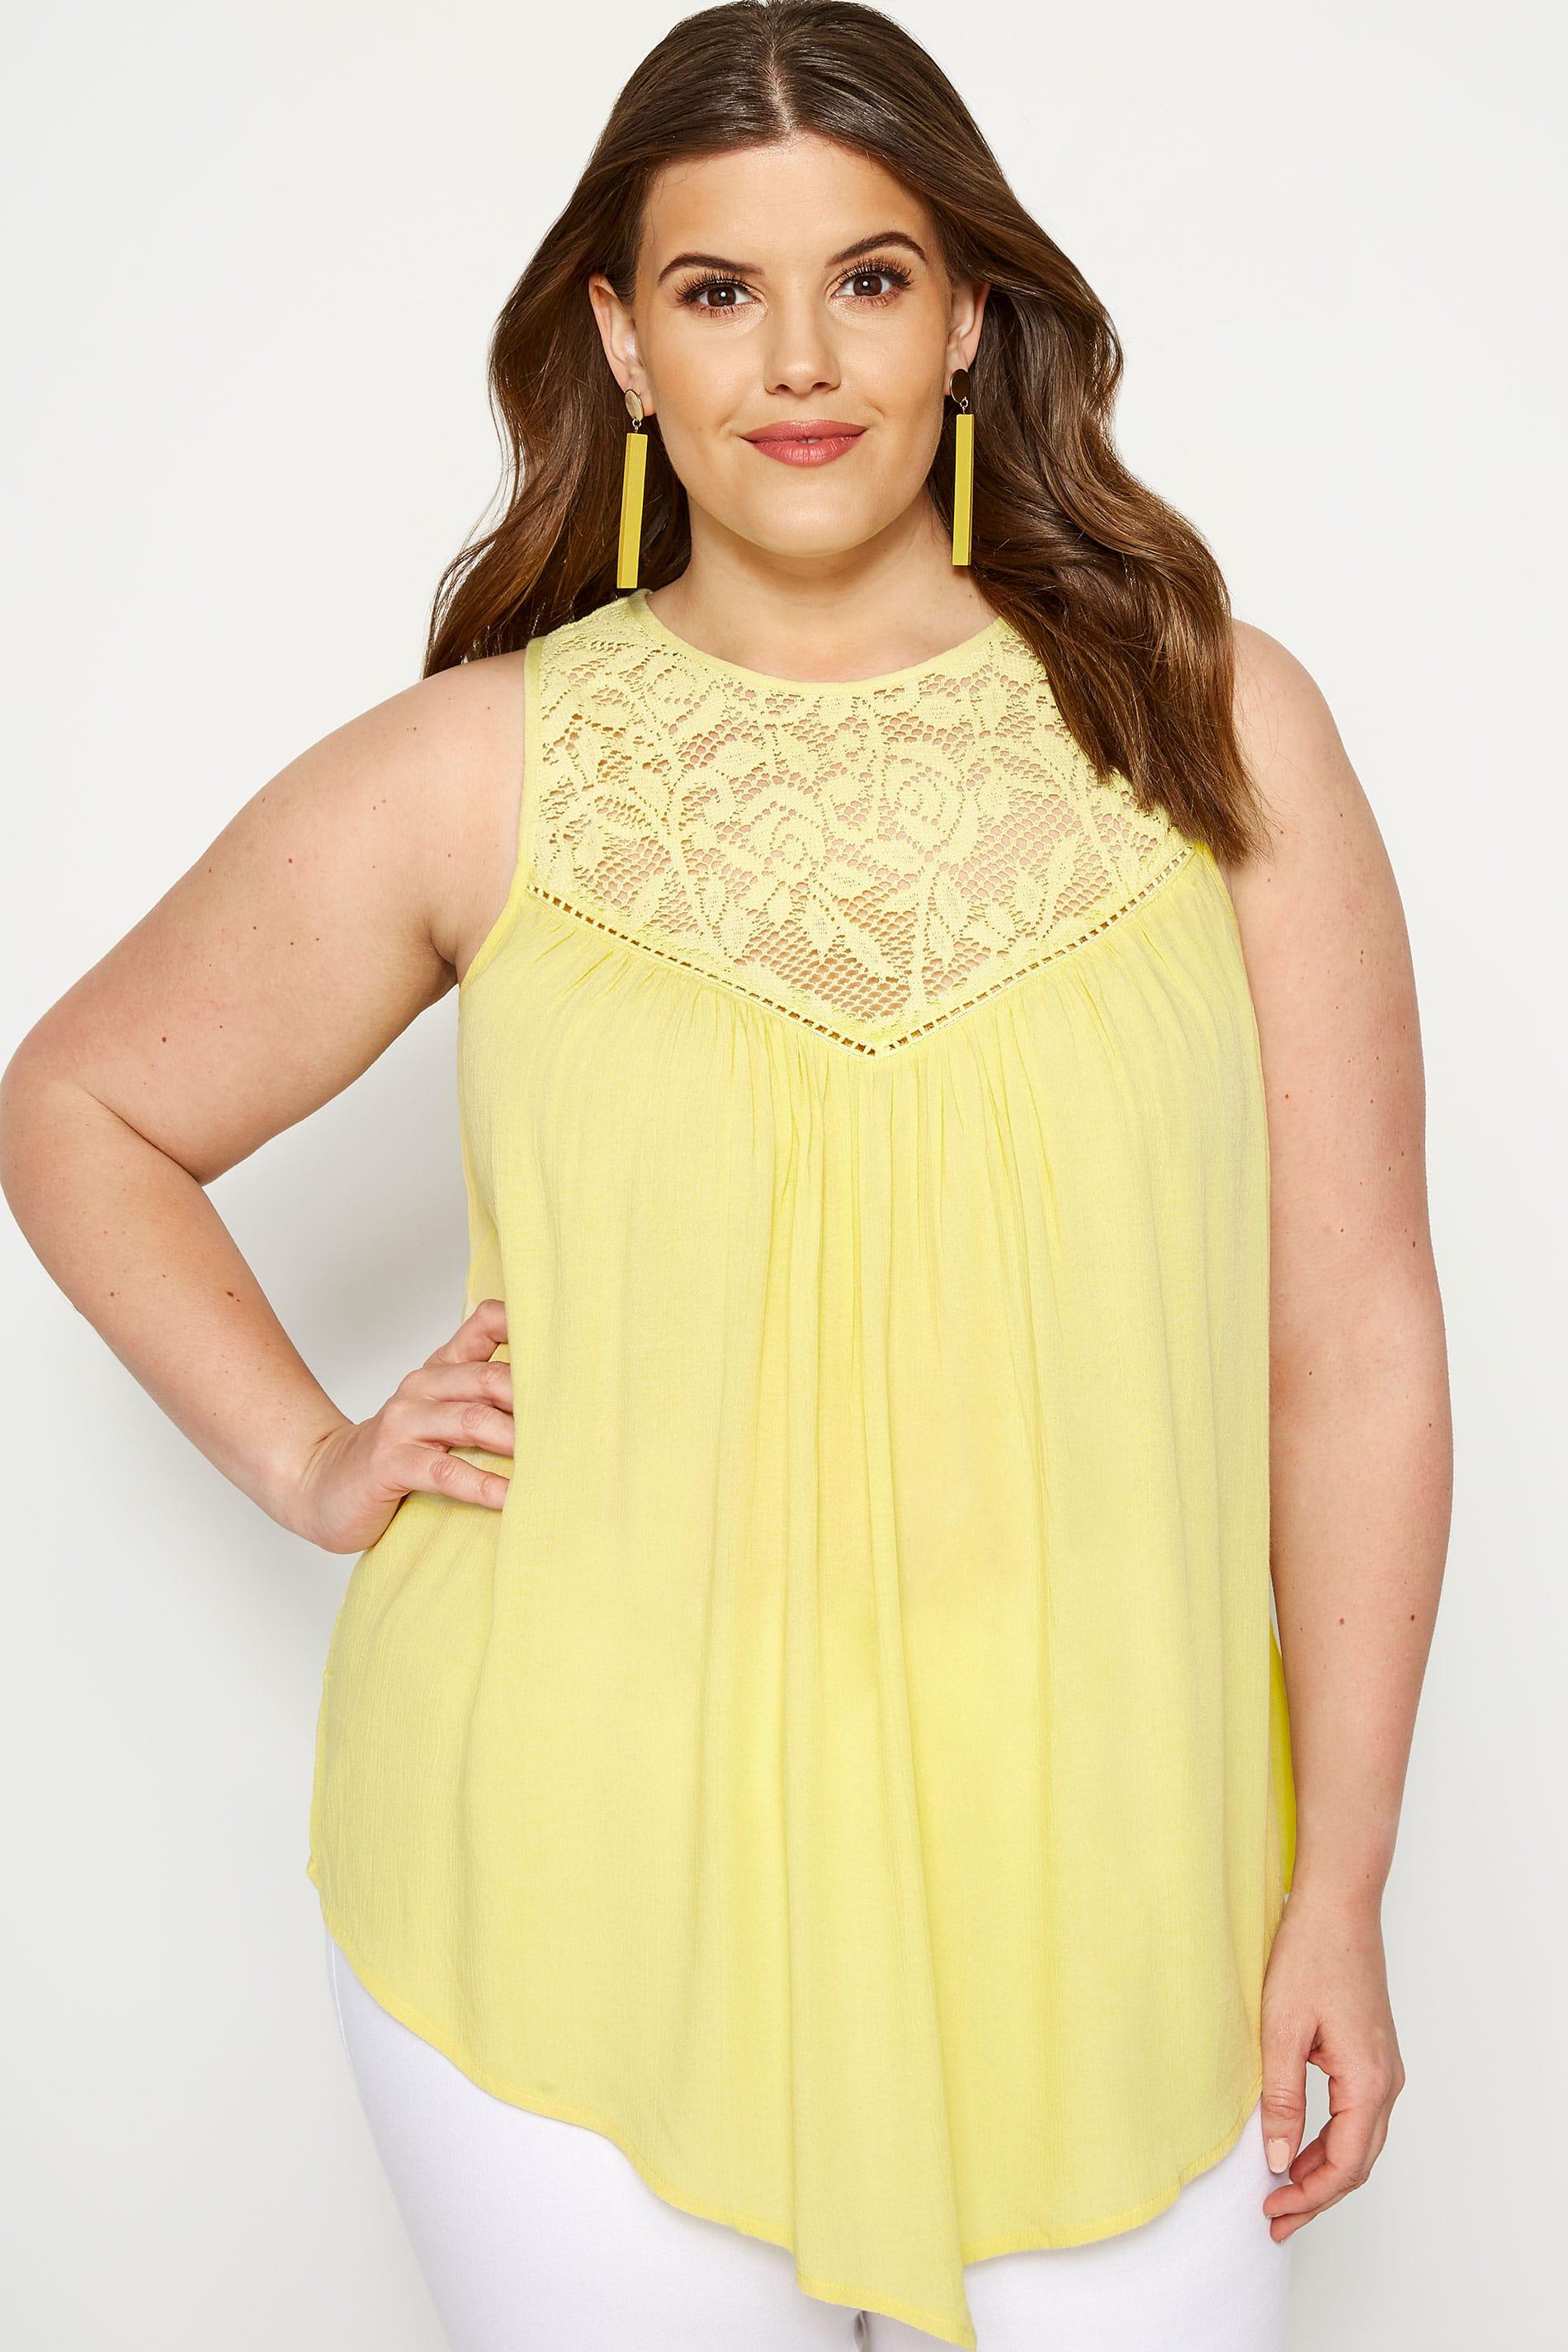 Yellow Lace Vest Top